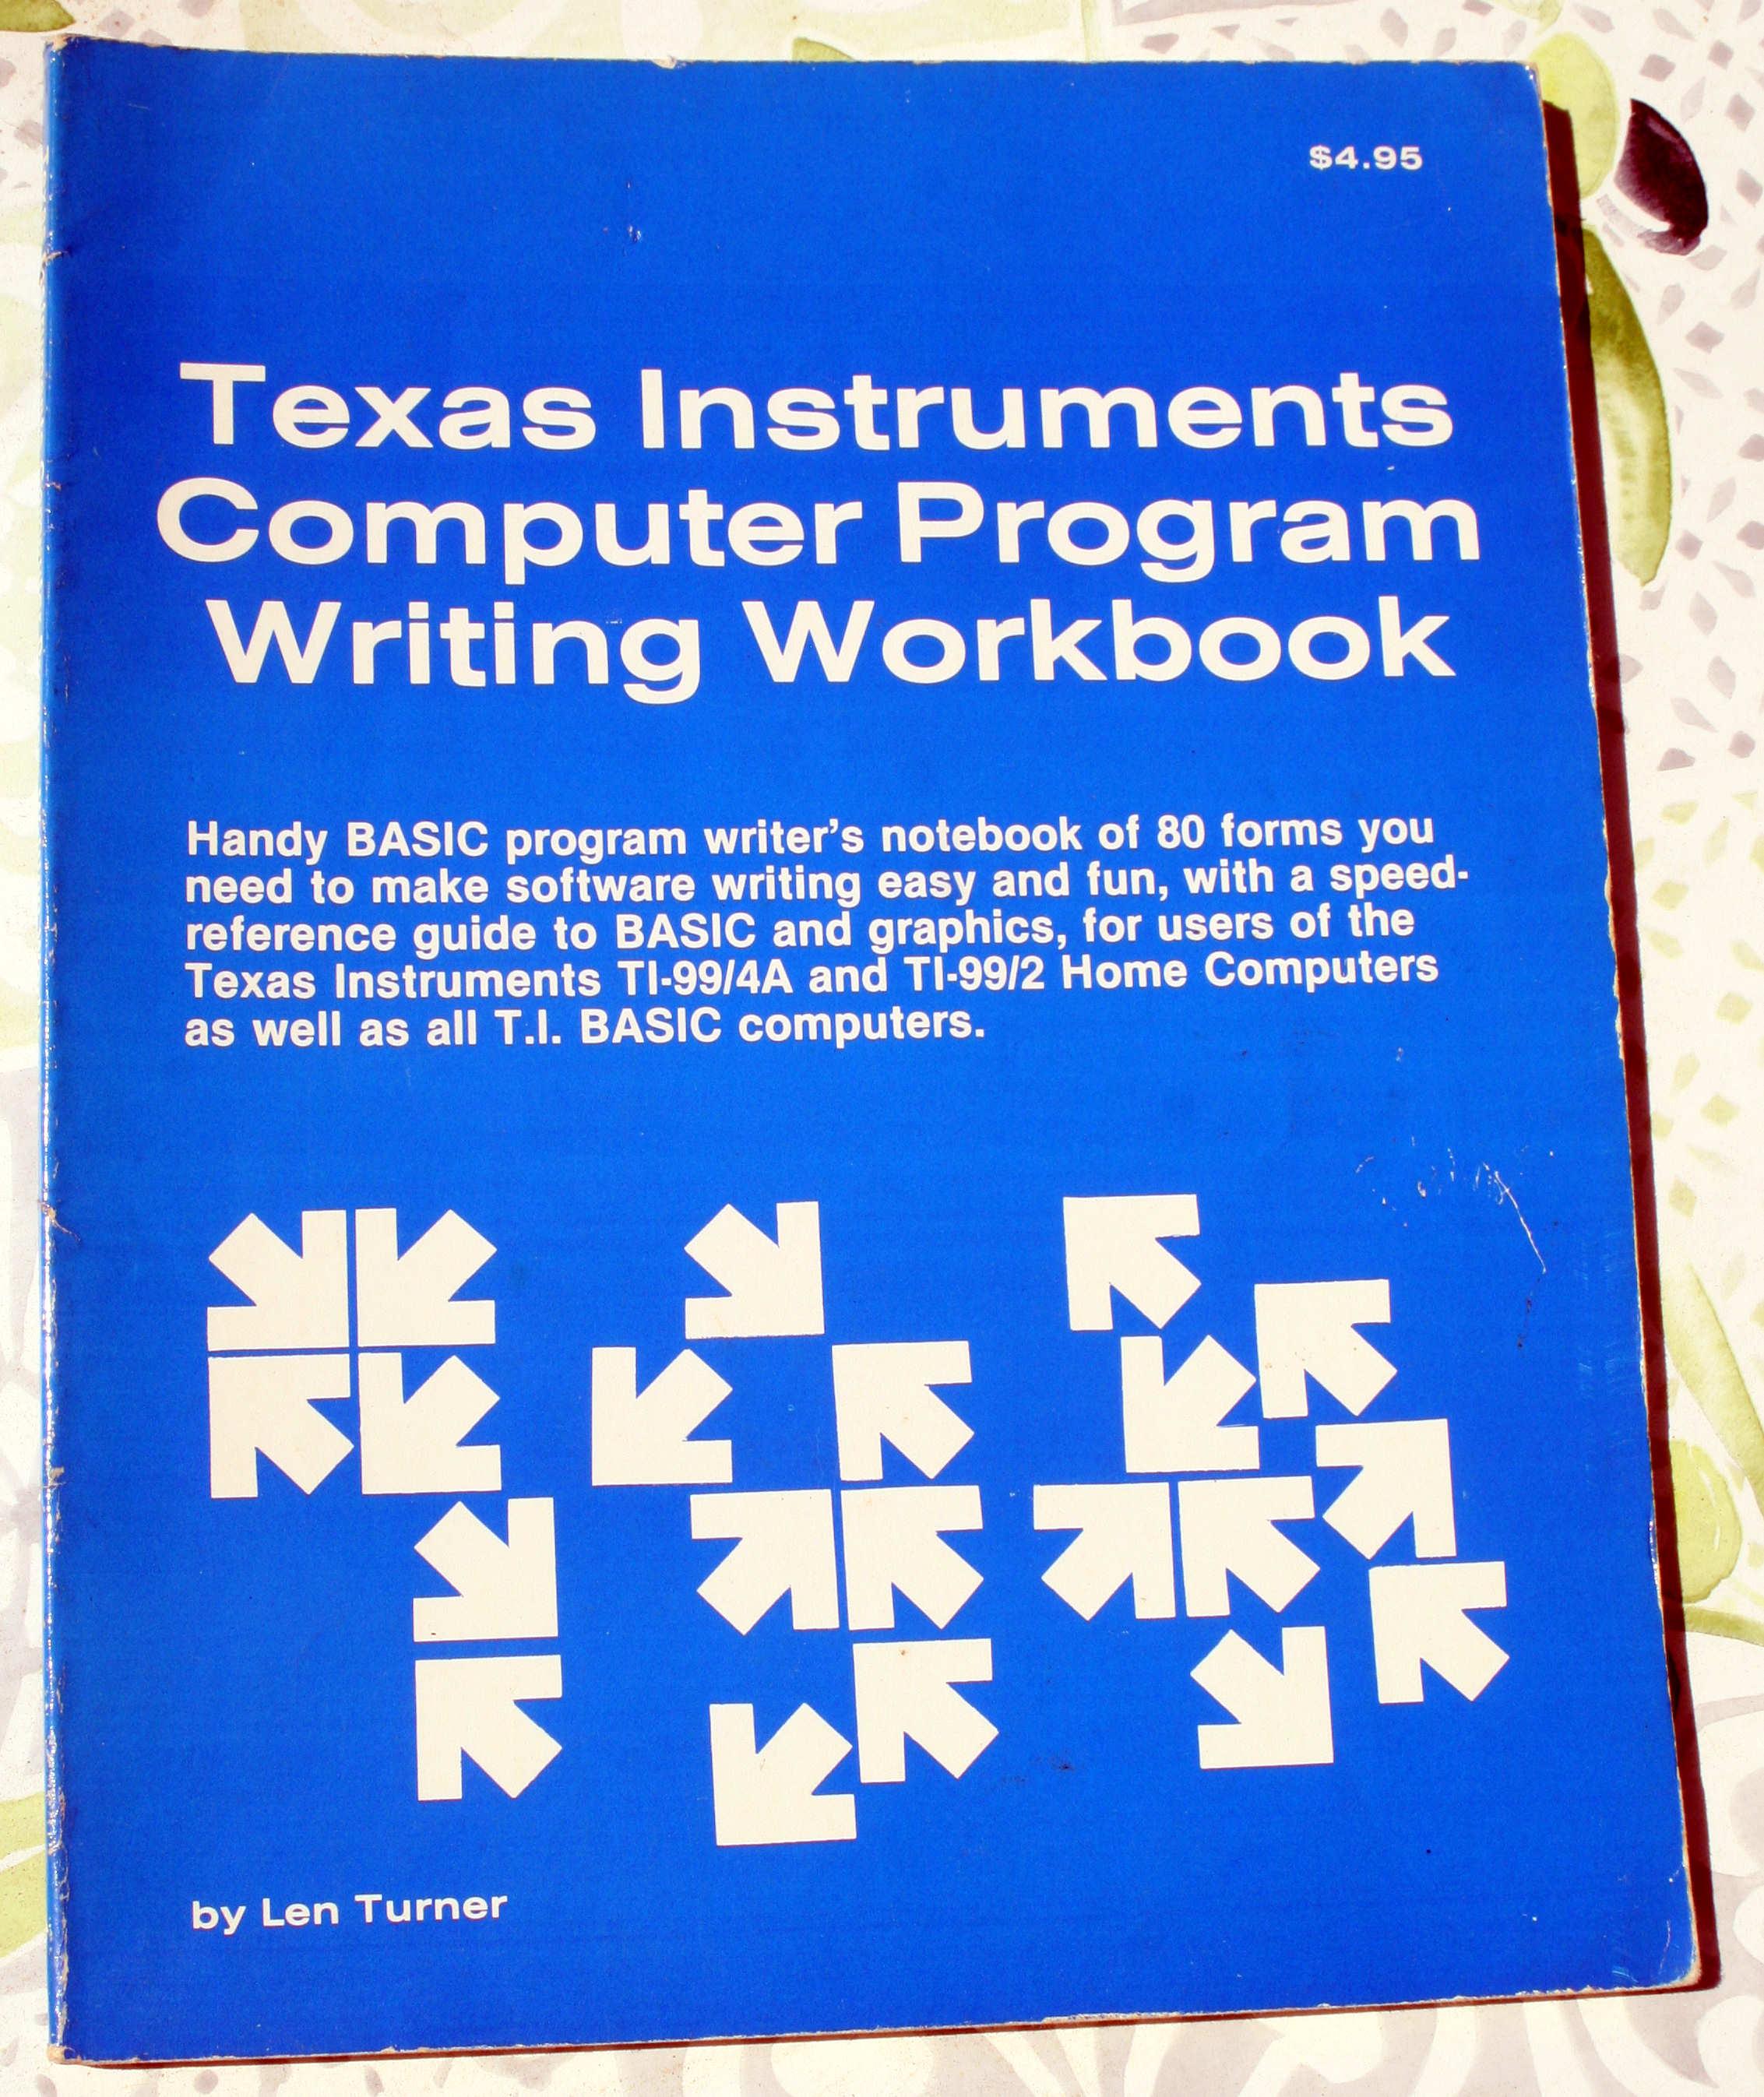 Computer Program Writing Workbook